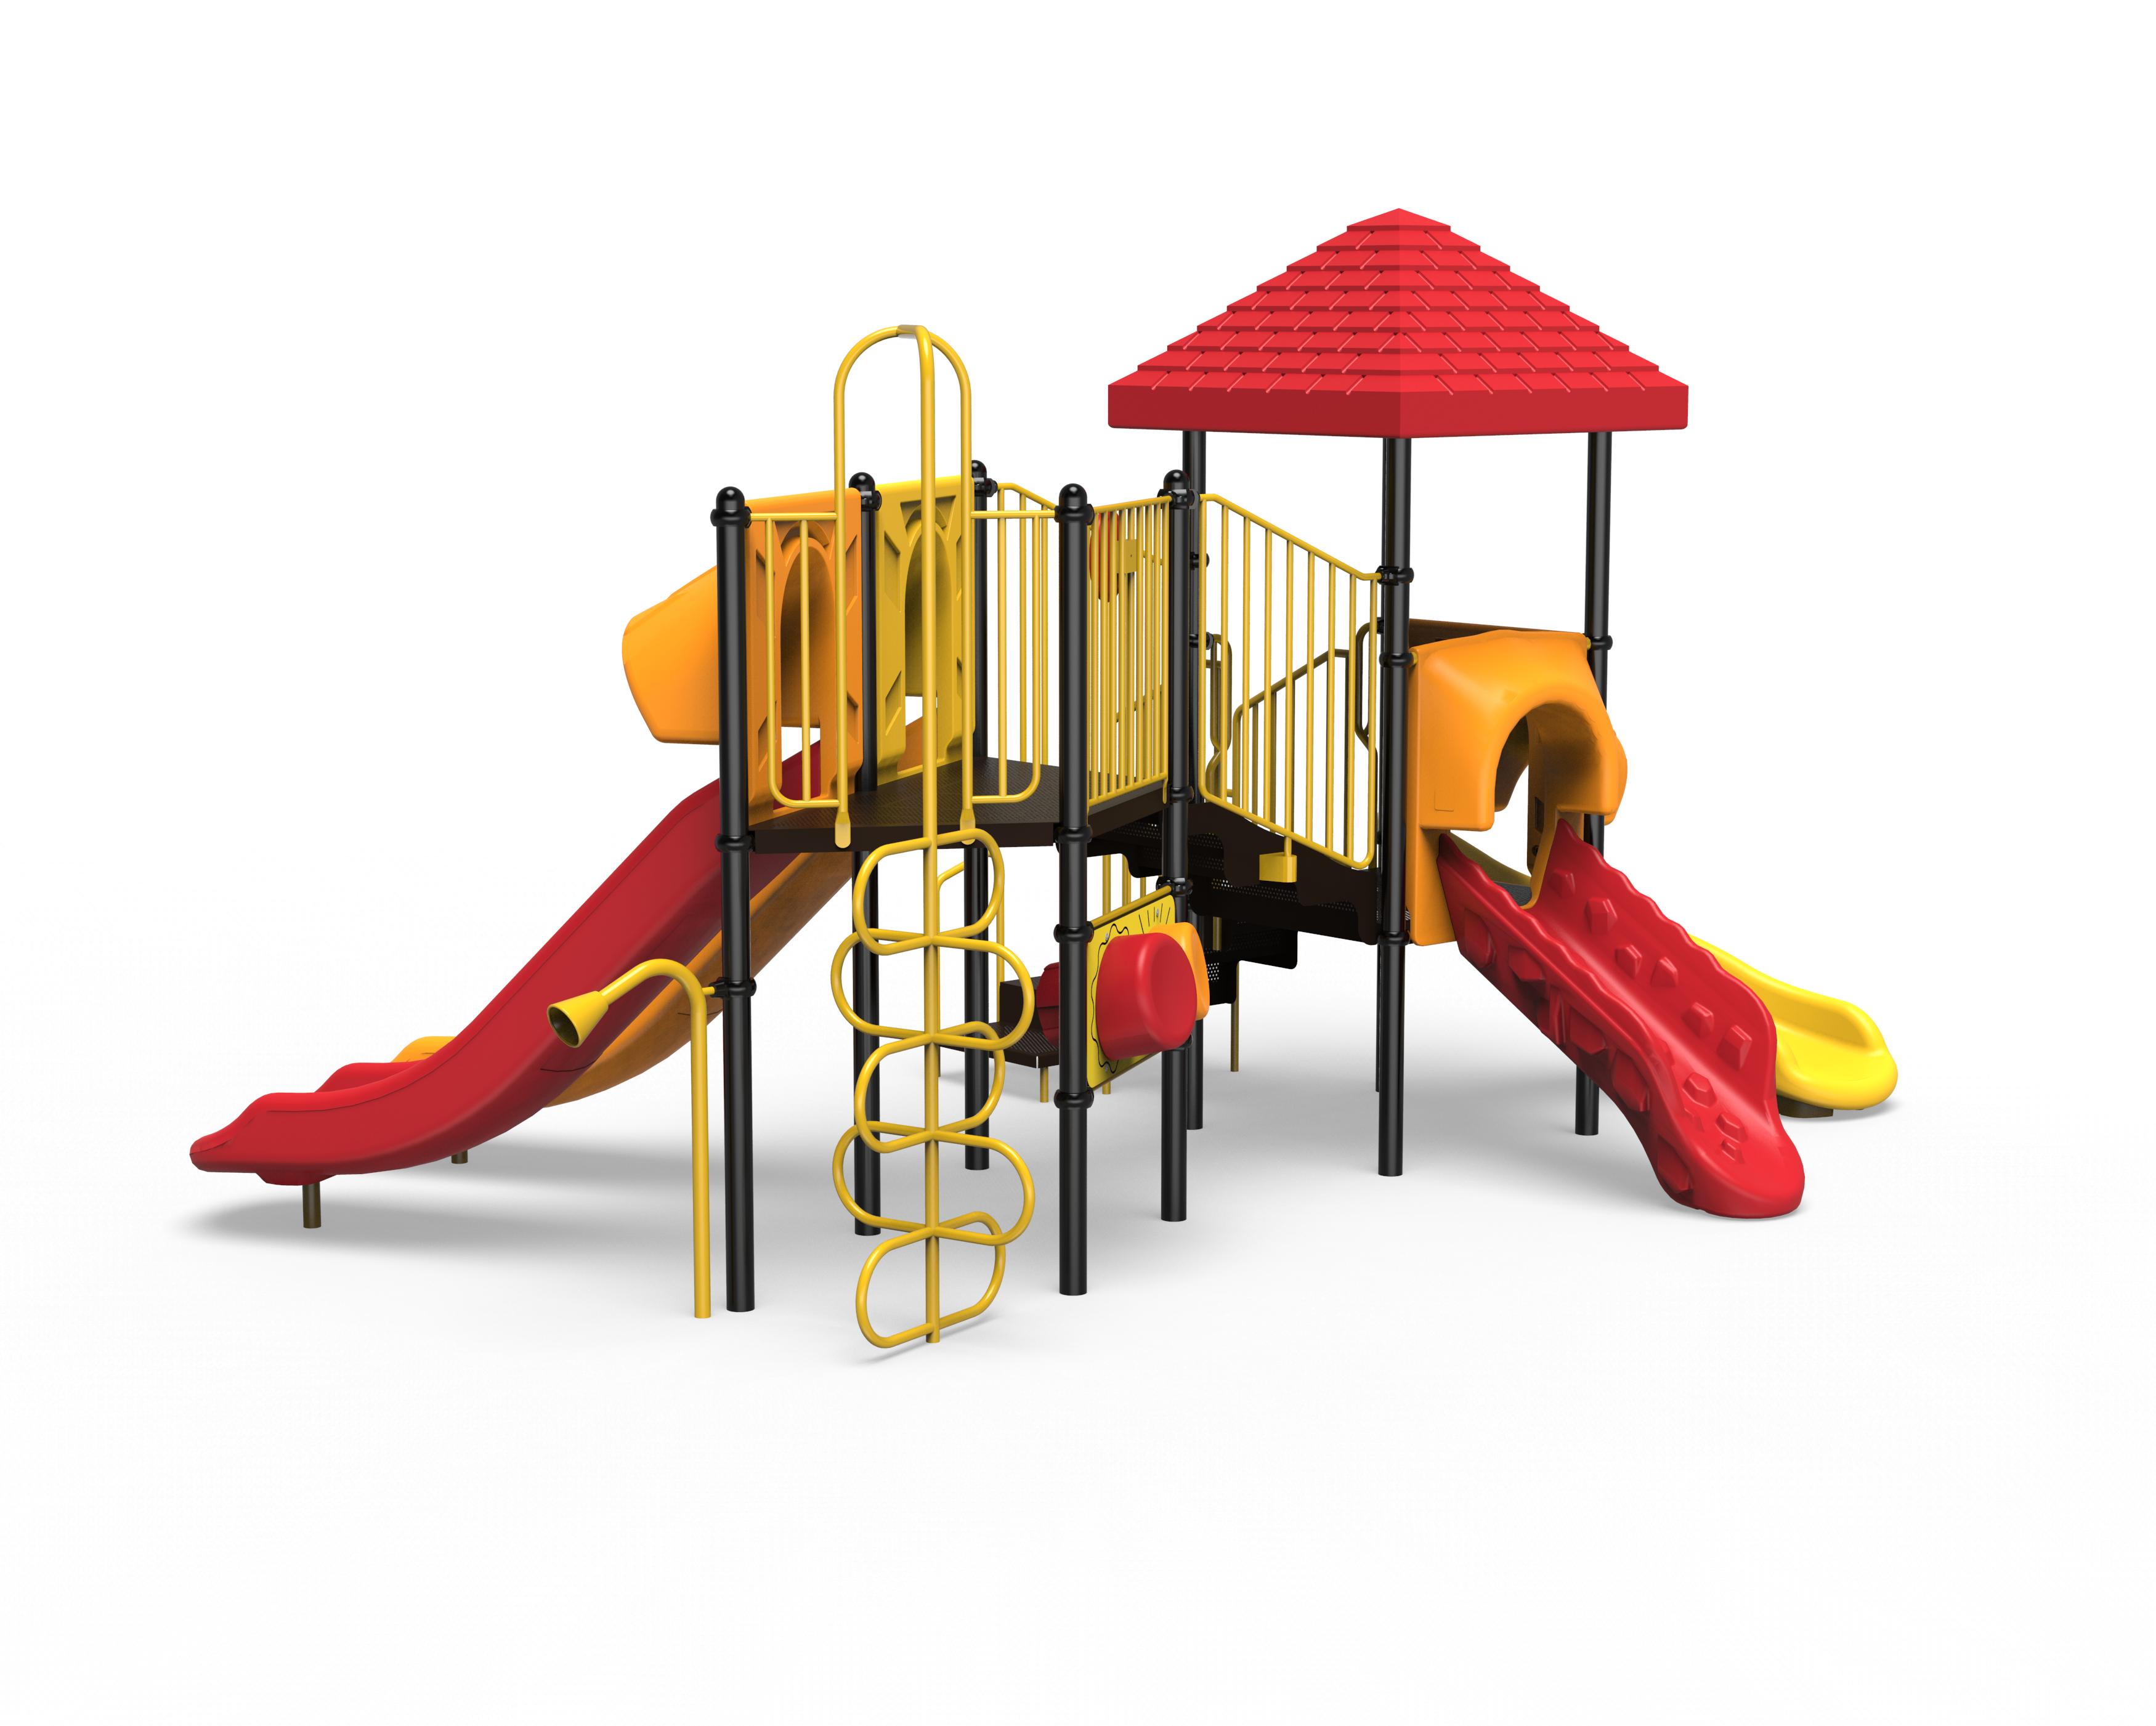 Tots' Choice Structure (718S190J)